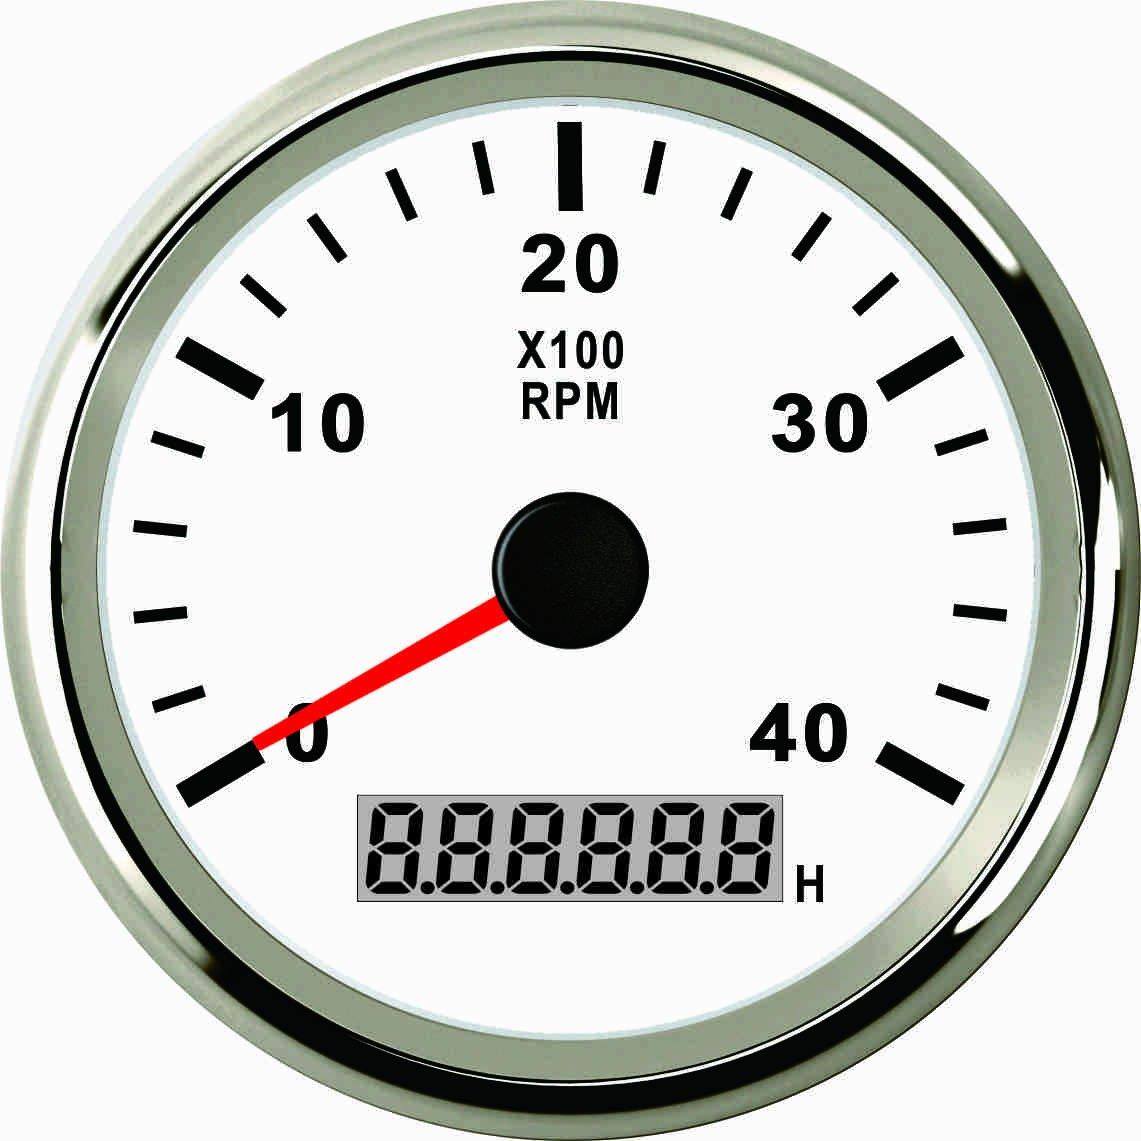 Tacó metro Medidor de RPM con contador de horas para coche camió n barco yate 0 –  4000rpm 85 mm con retroiluminació n ELING